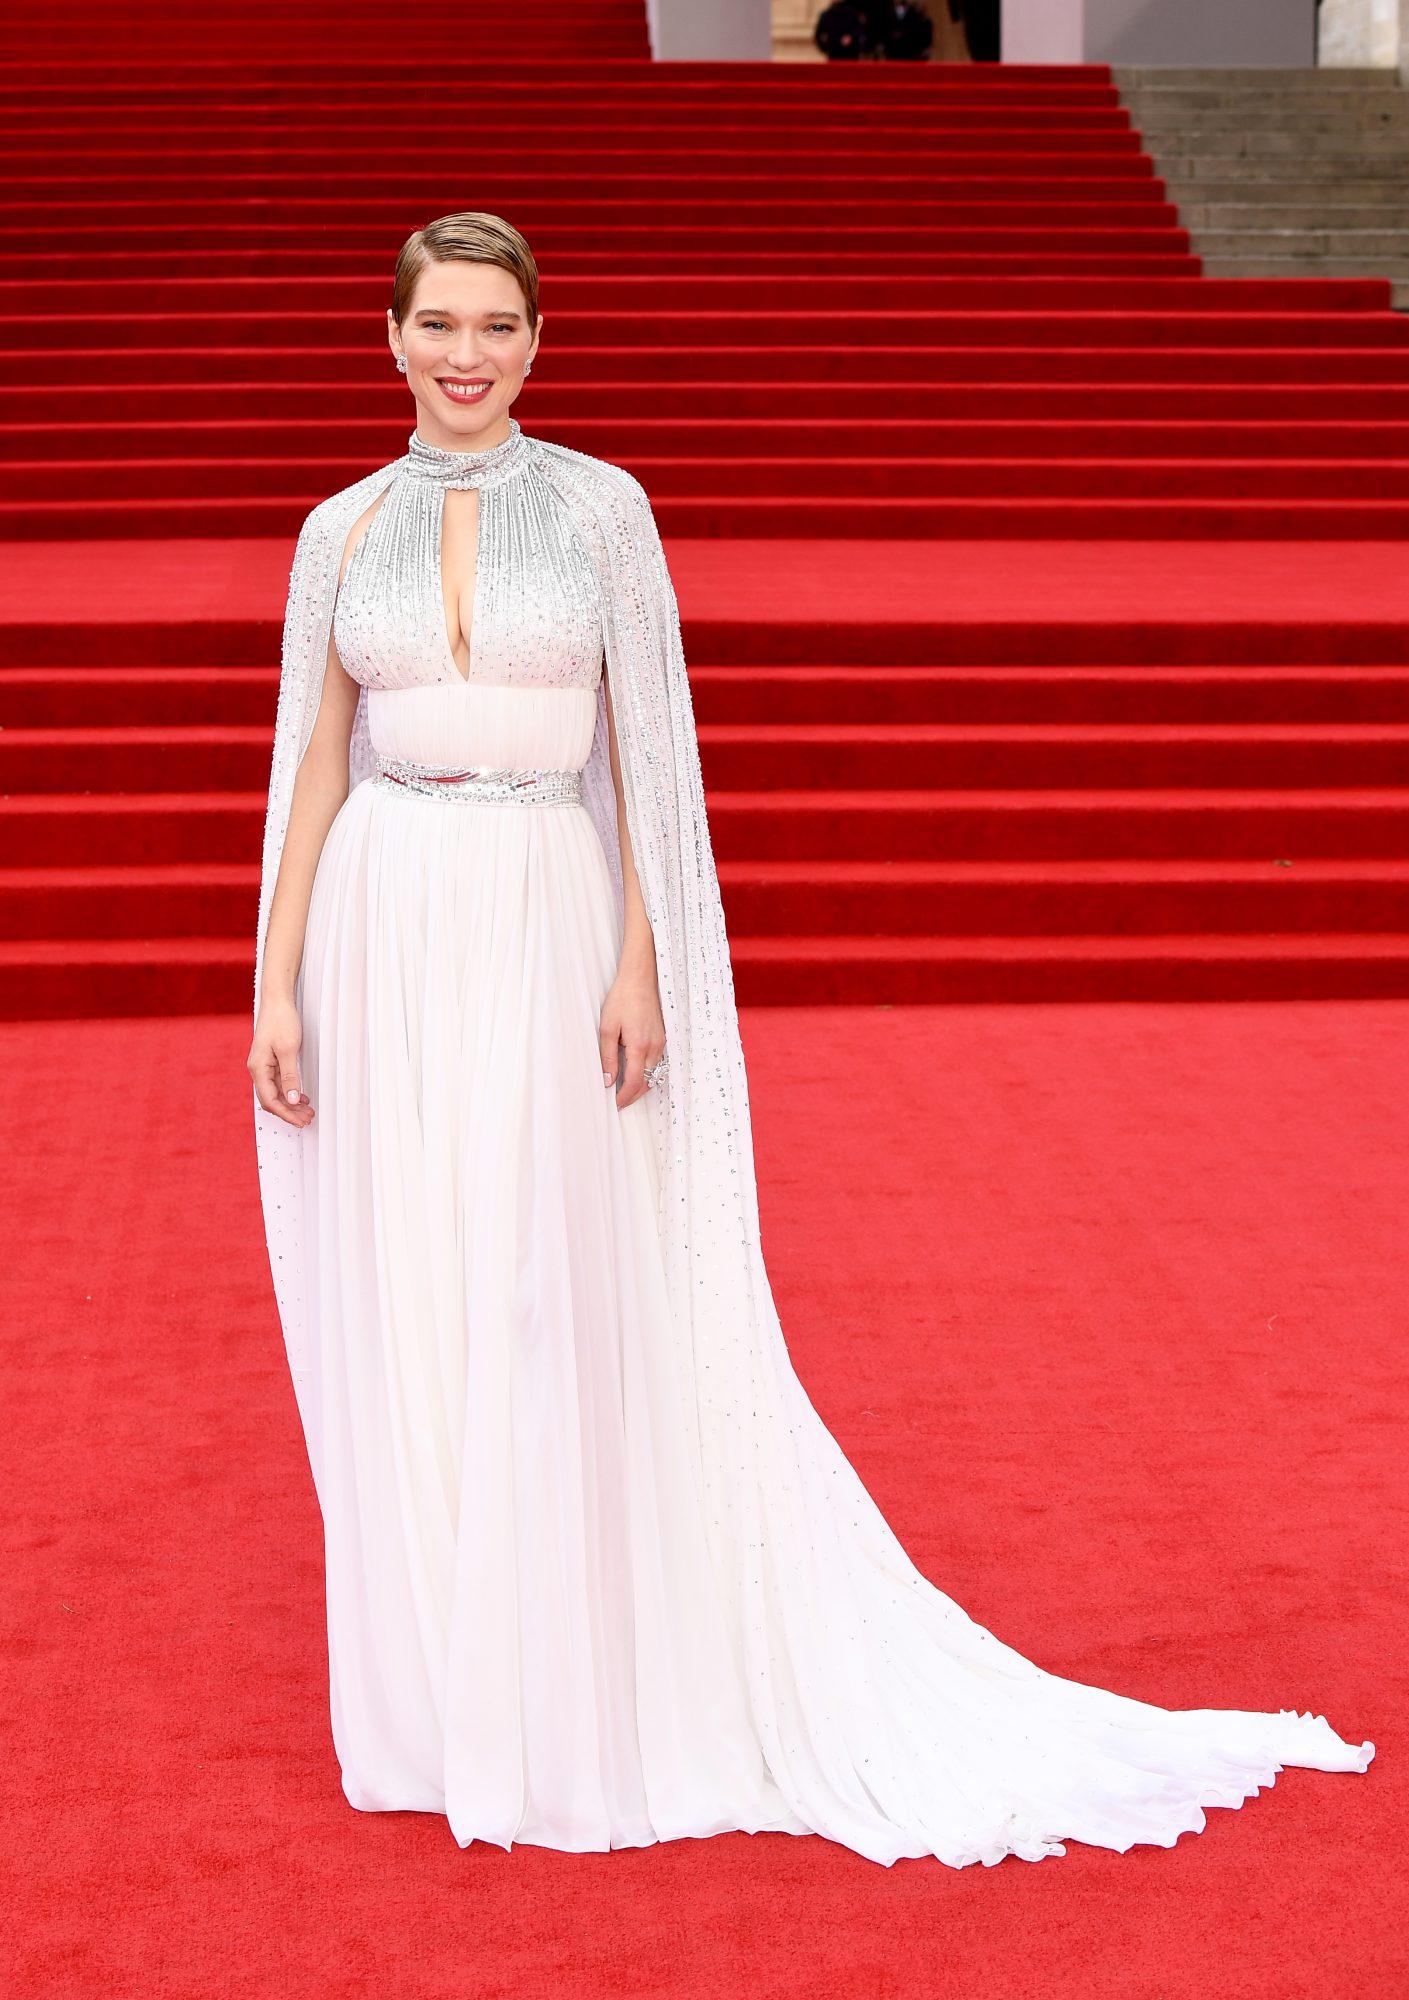 James Bond, No Time to Die estreno, alfombra roja, Léa Seydoux